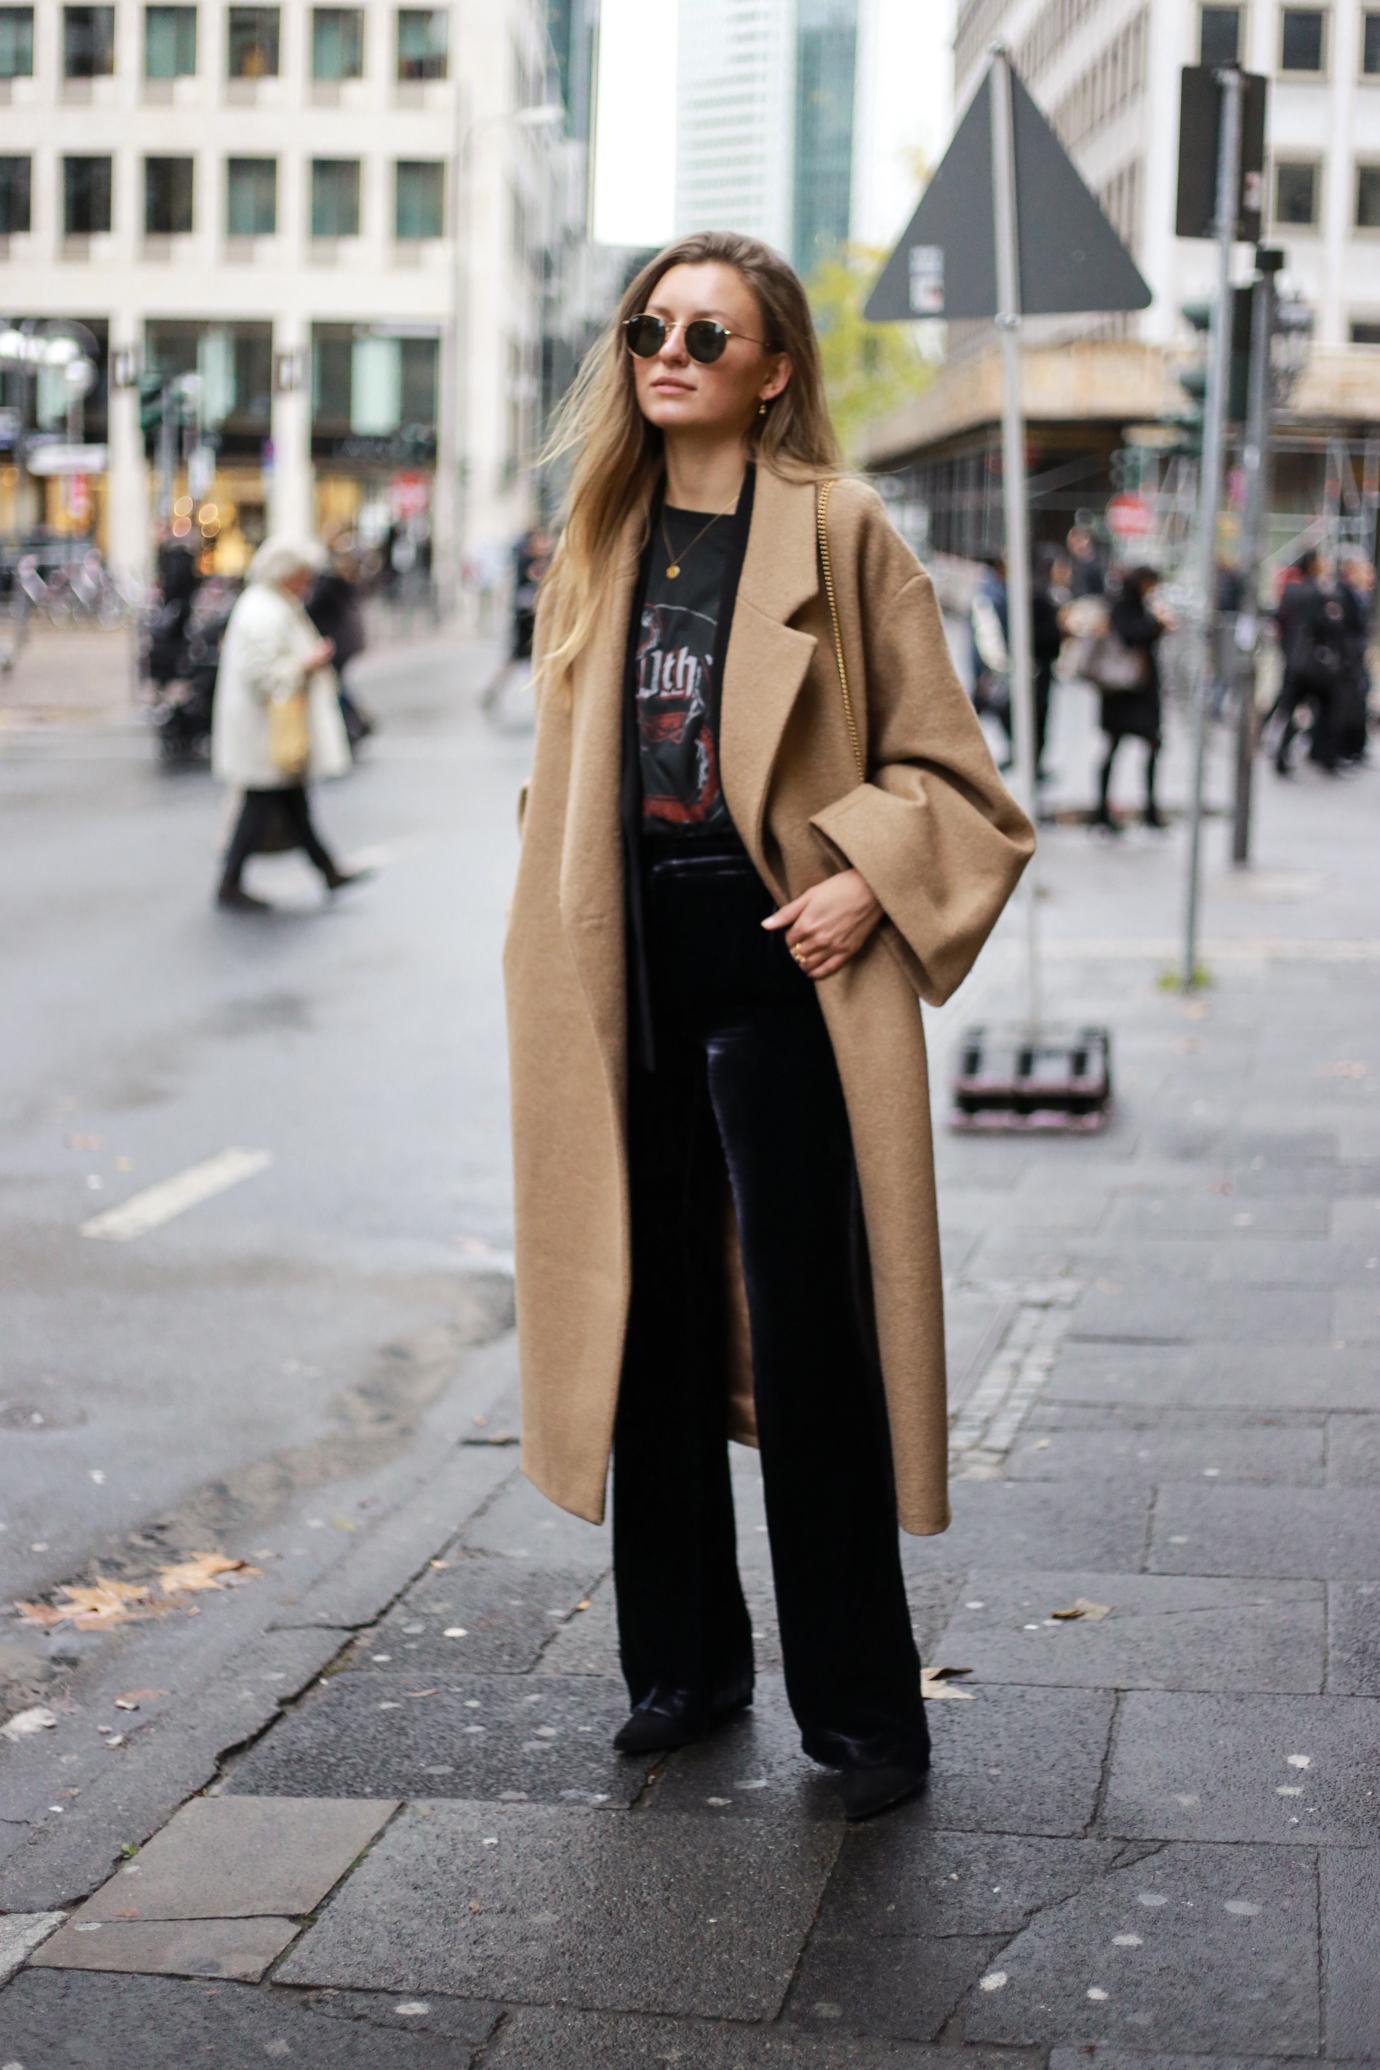 velvet-band-shirt-camel-coat-outfit-livia-auer-6516